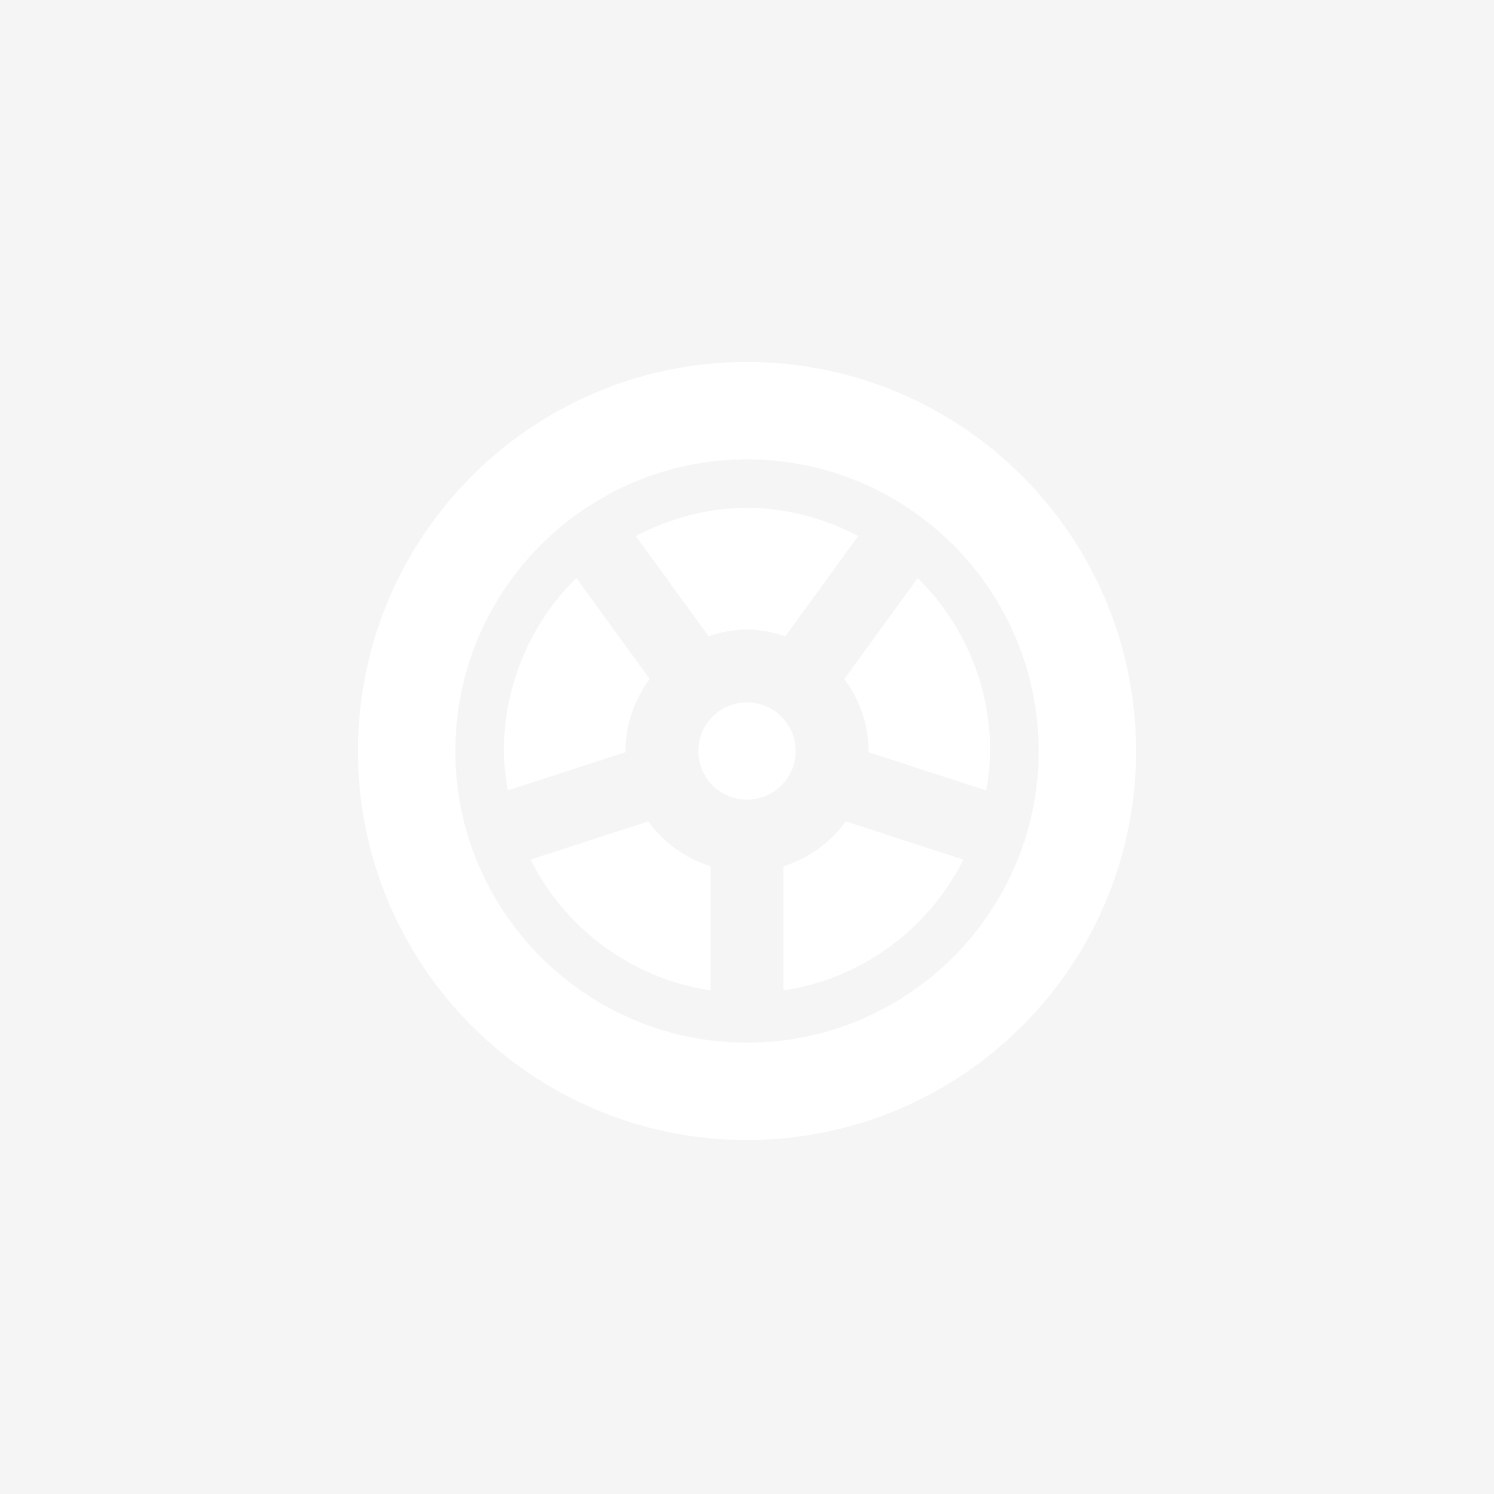 Continental ContiPremiumContact 5 215/55 R17